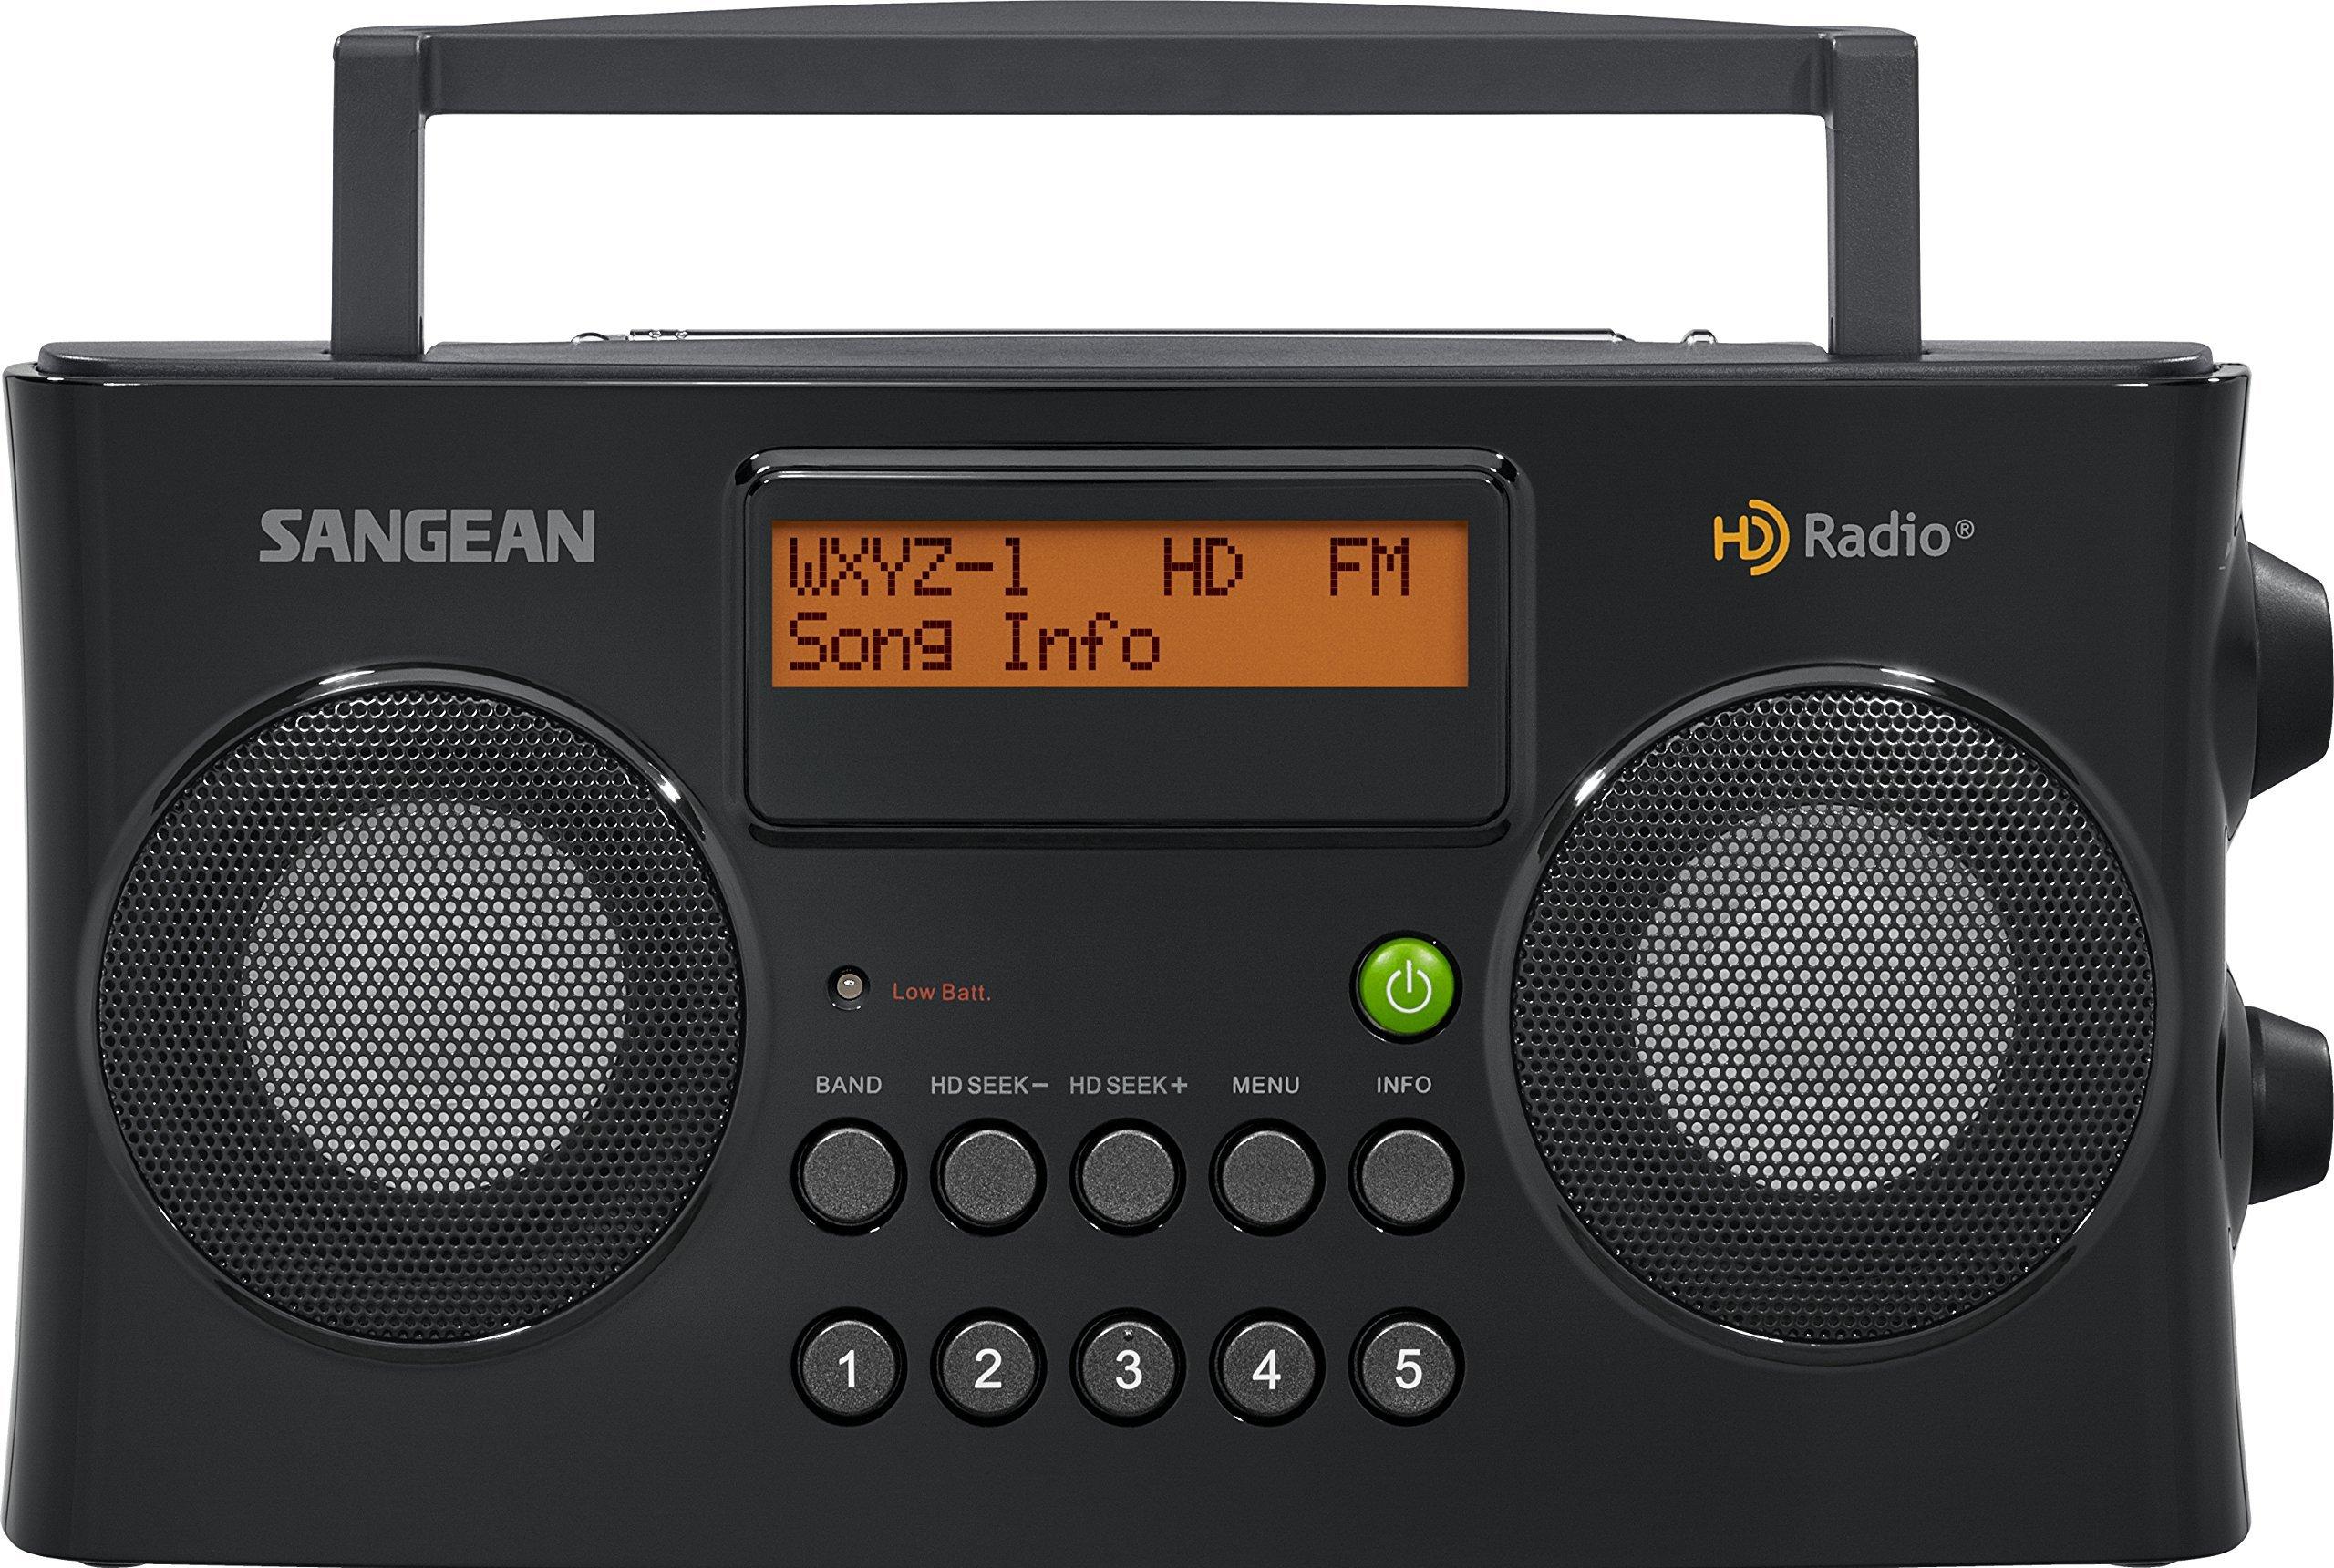 Sangean HDR-16 HD Radio/FM-Stereo/AM Portable Radio (Certified Refurbished)